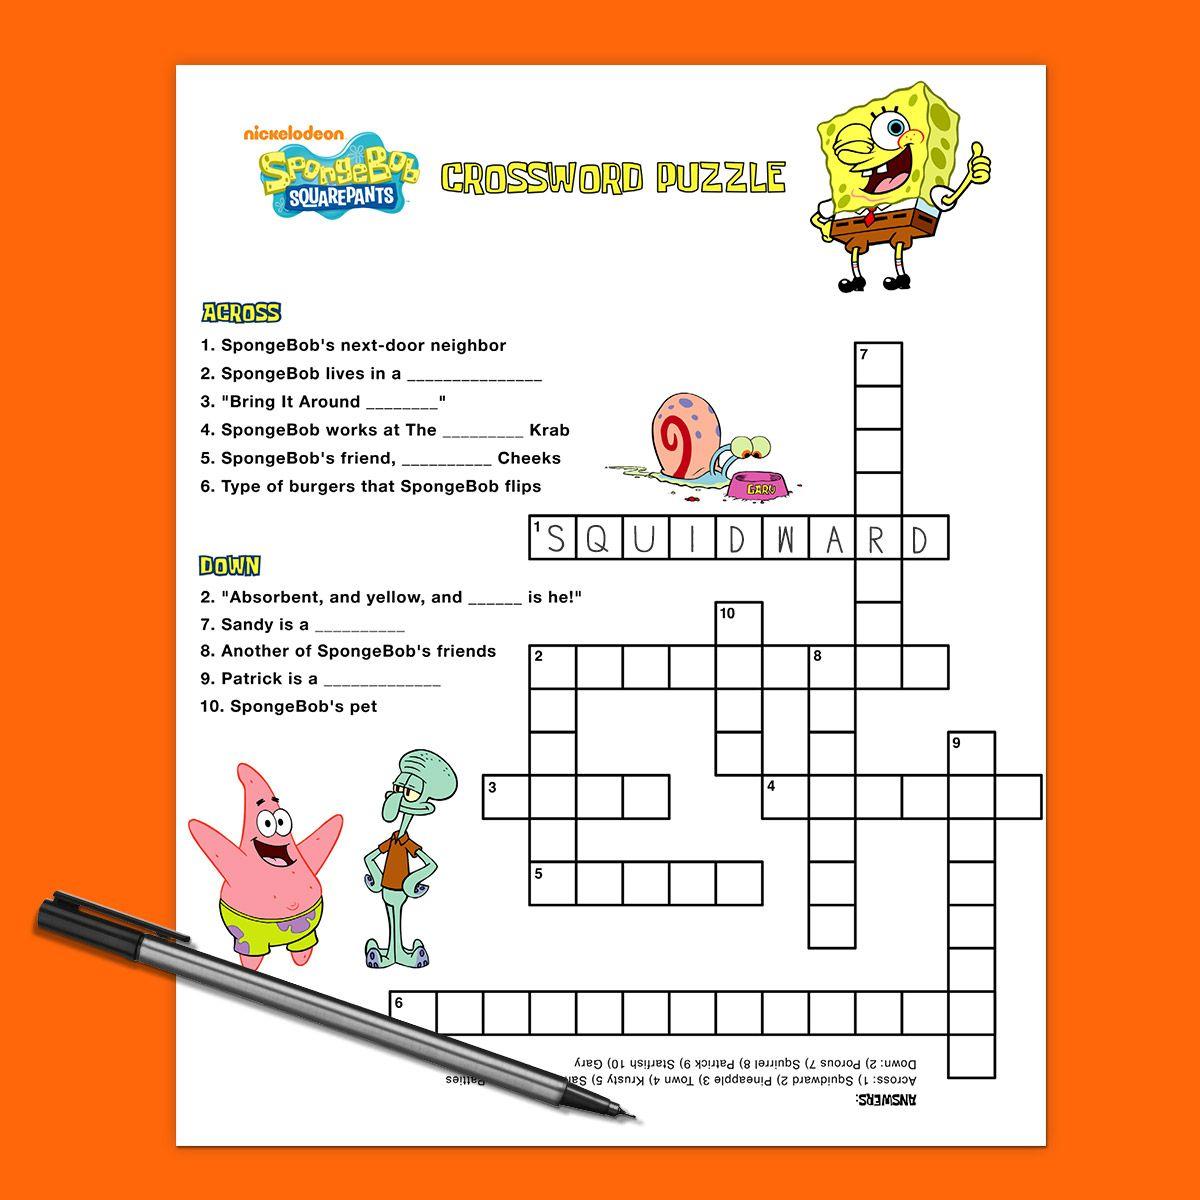 C A Ef C B A Parts Of Speech Spongebob Squarepants moreover F D C Ab E E F C C Spongebob Party Spongebob Squarepants additionally C E E A B Fe D Ee F Dcb as well D Ef Ce Bfbdce Bec Bc F Eb Sylvester Tweety Looney Tunes together with B Eb F Fb A Ba A D B. on spongebob squarepants worksheets kindergarten